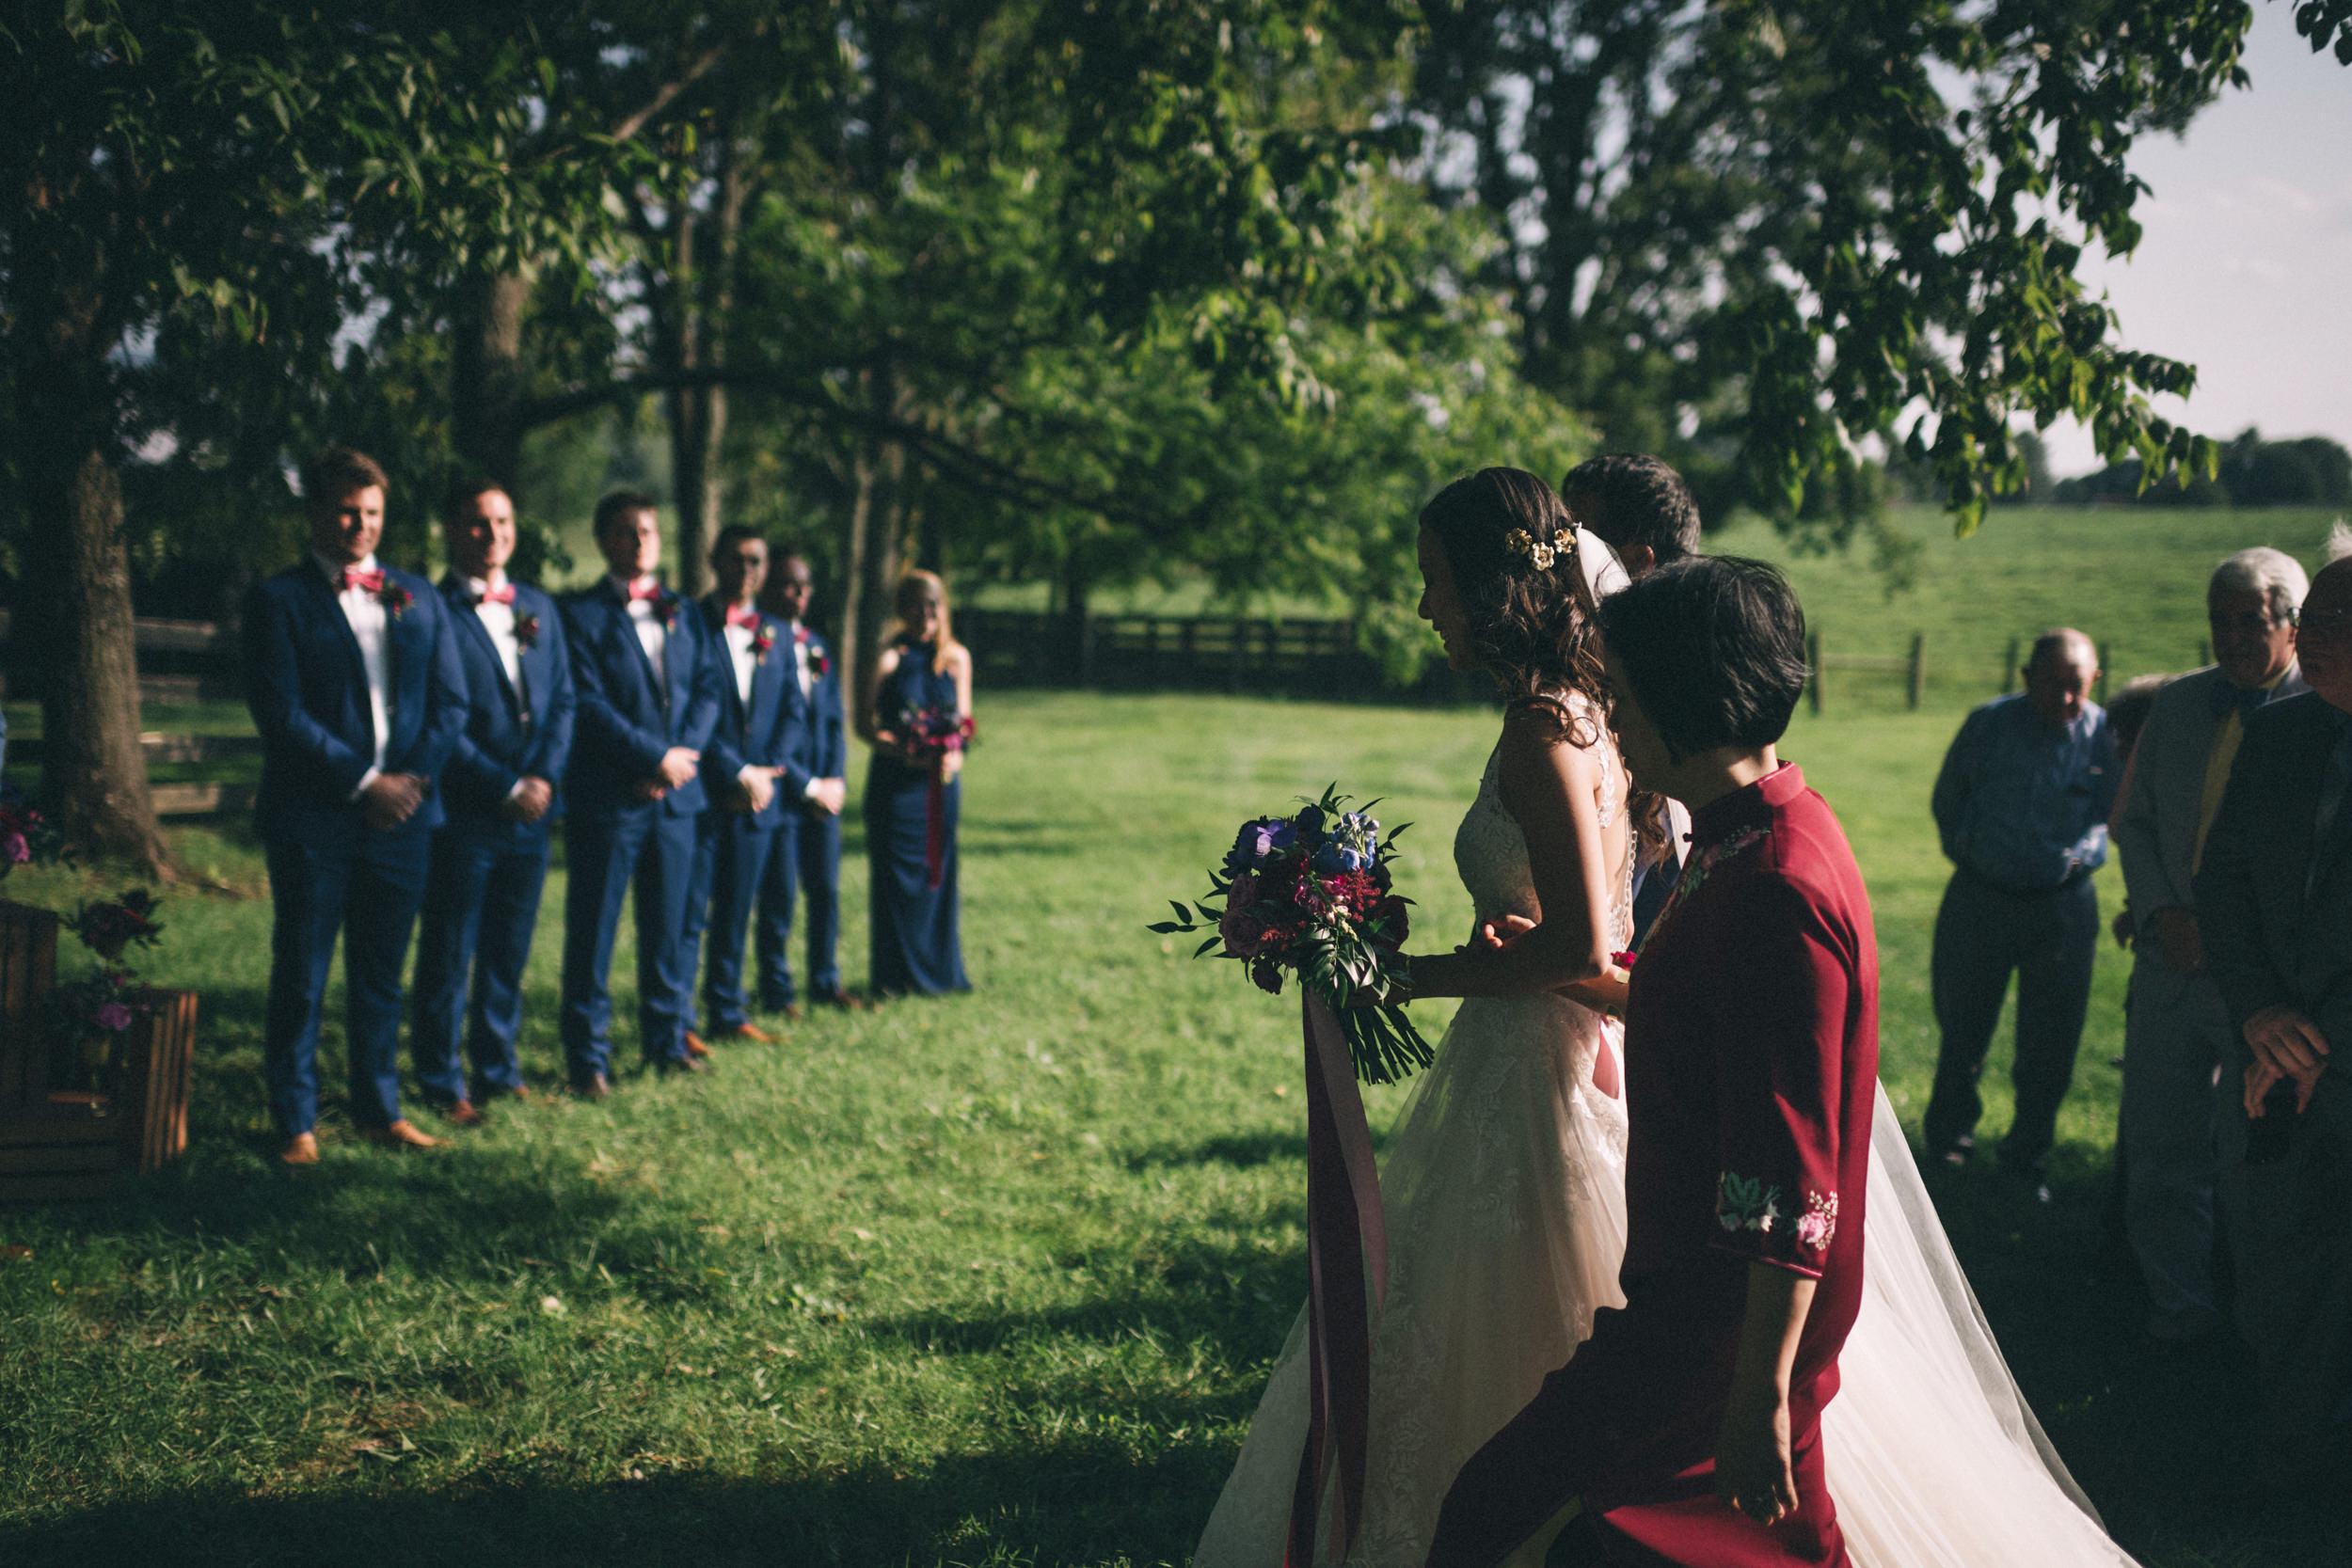 Louisville-Kentucky-Wedding-and-Elopement-Photographer-Sarah-Katherine-Davis-Photography-Summer-Jewel-Toned-Wedding-Chineese-Tea-Ceremony-Warrenwood-Manor-Danville-498.jpg